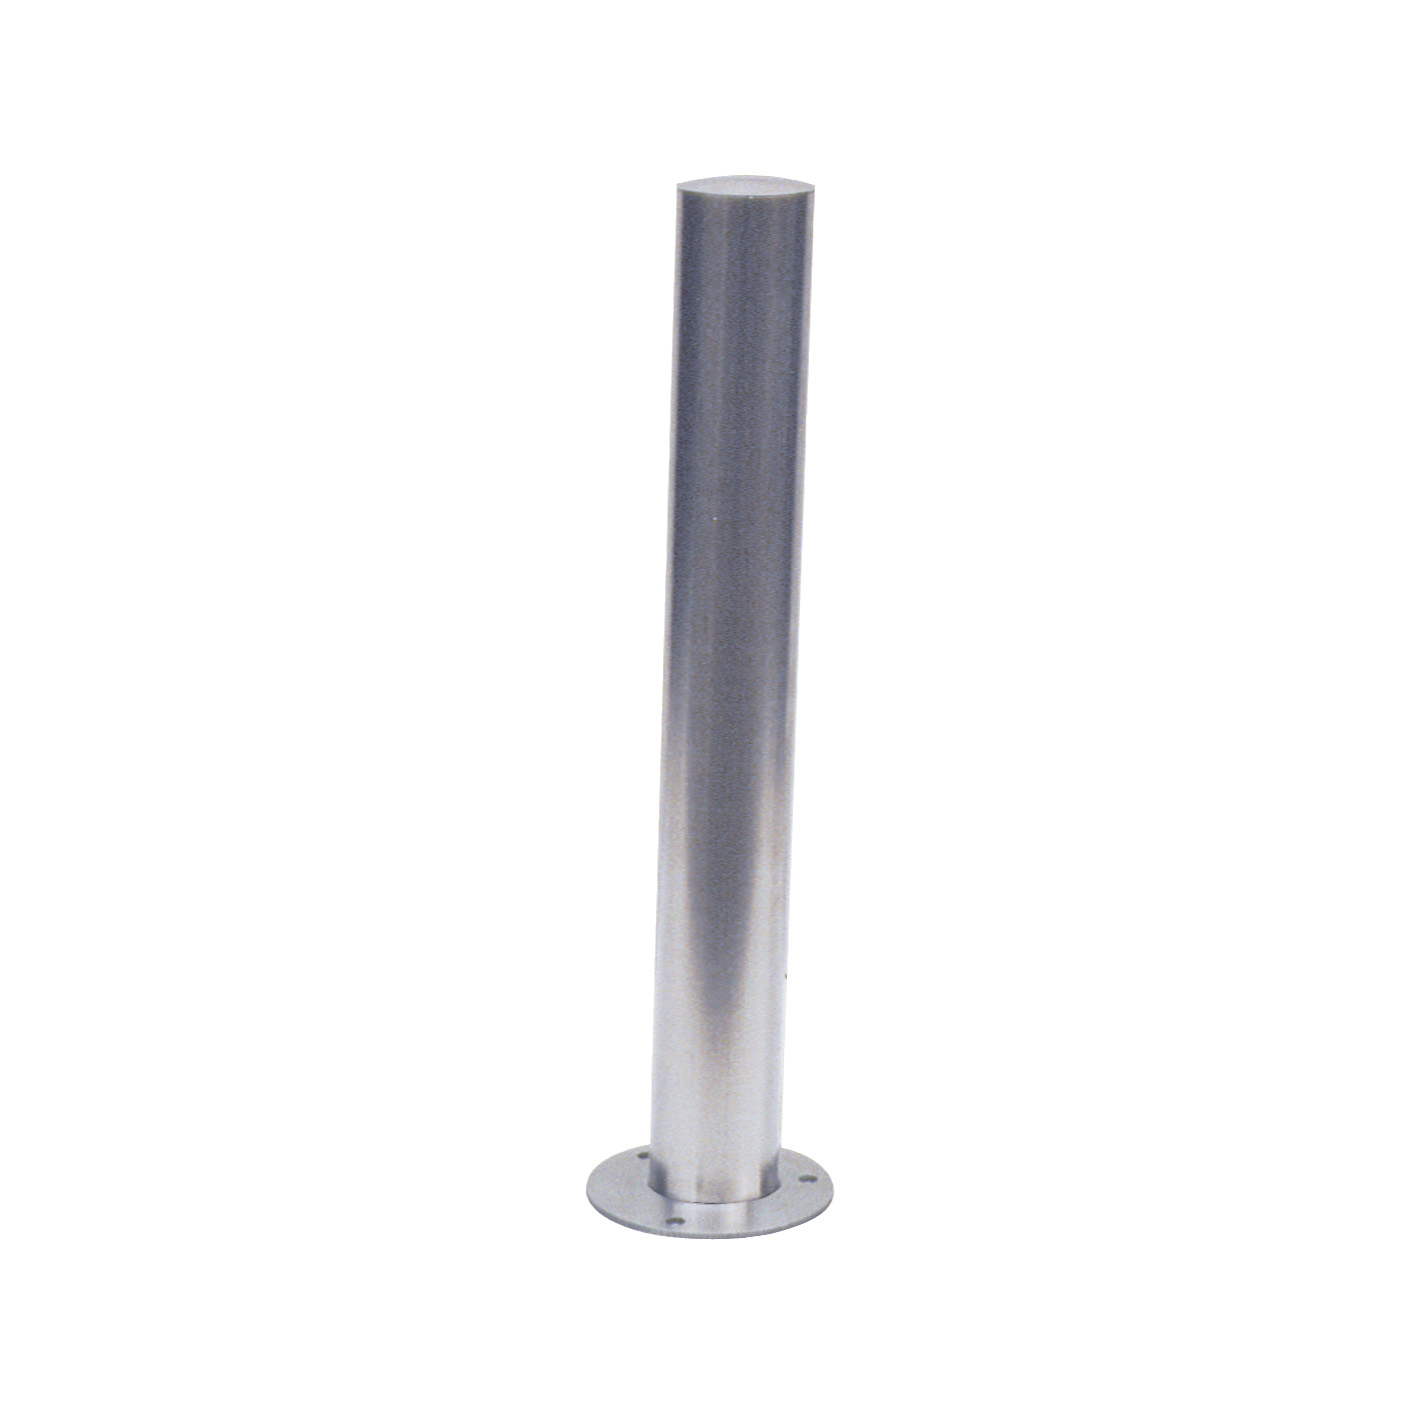 Edelstahlpfosten 40103 | Ø 102 x 900 mm